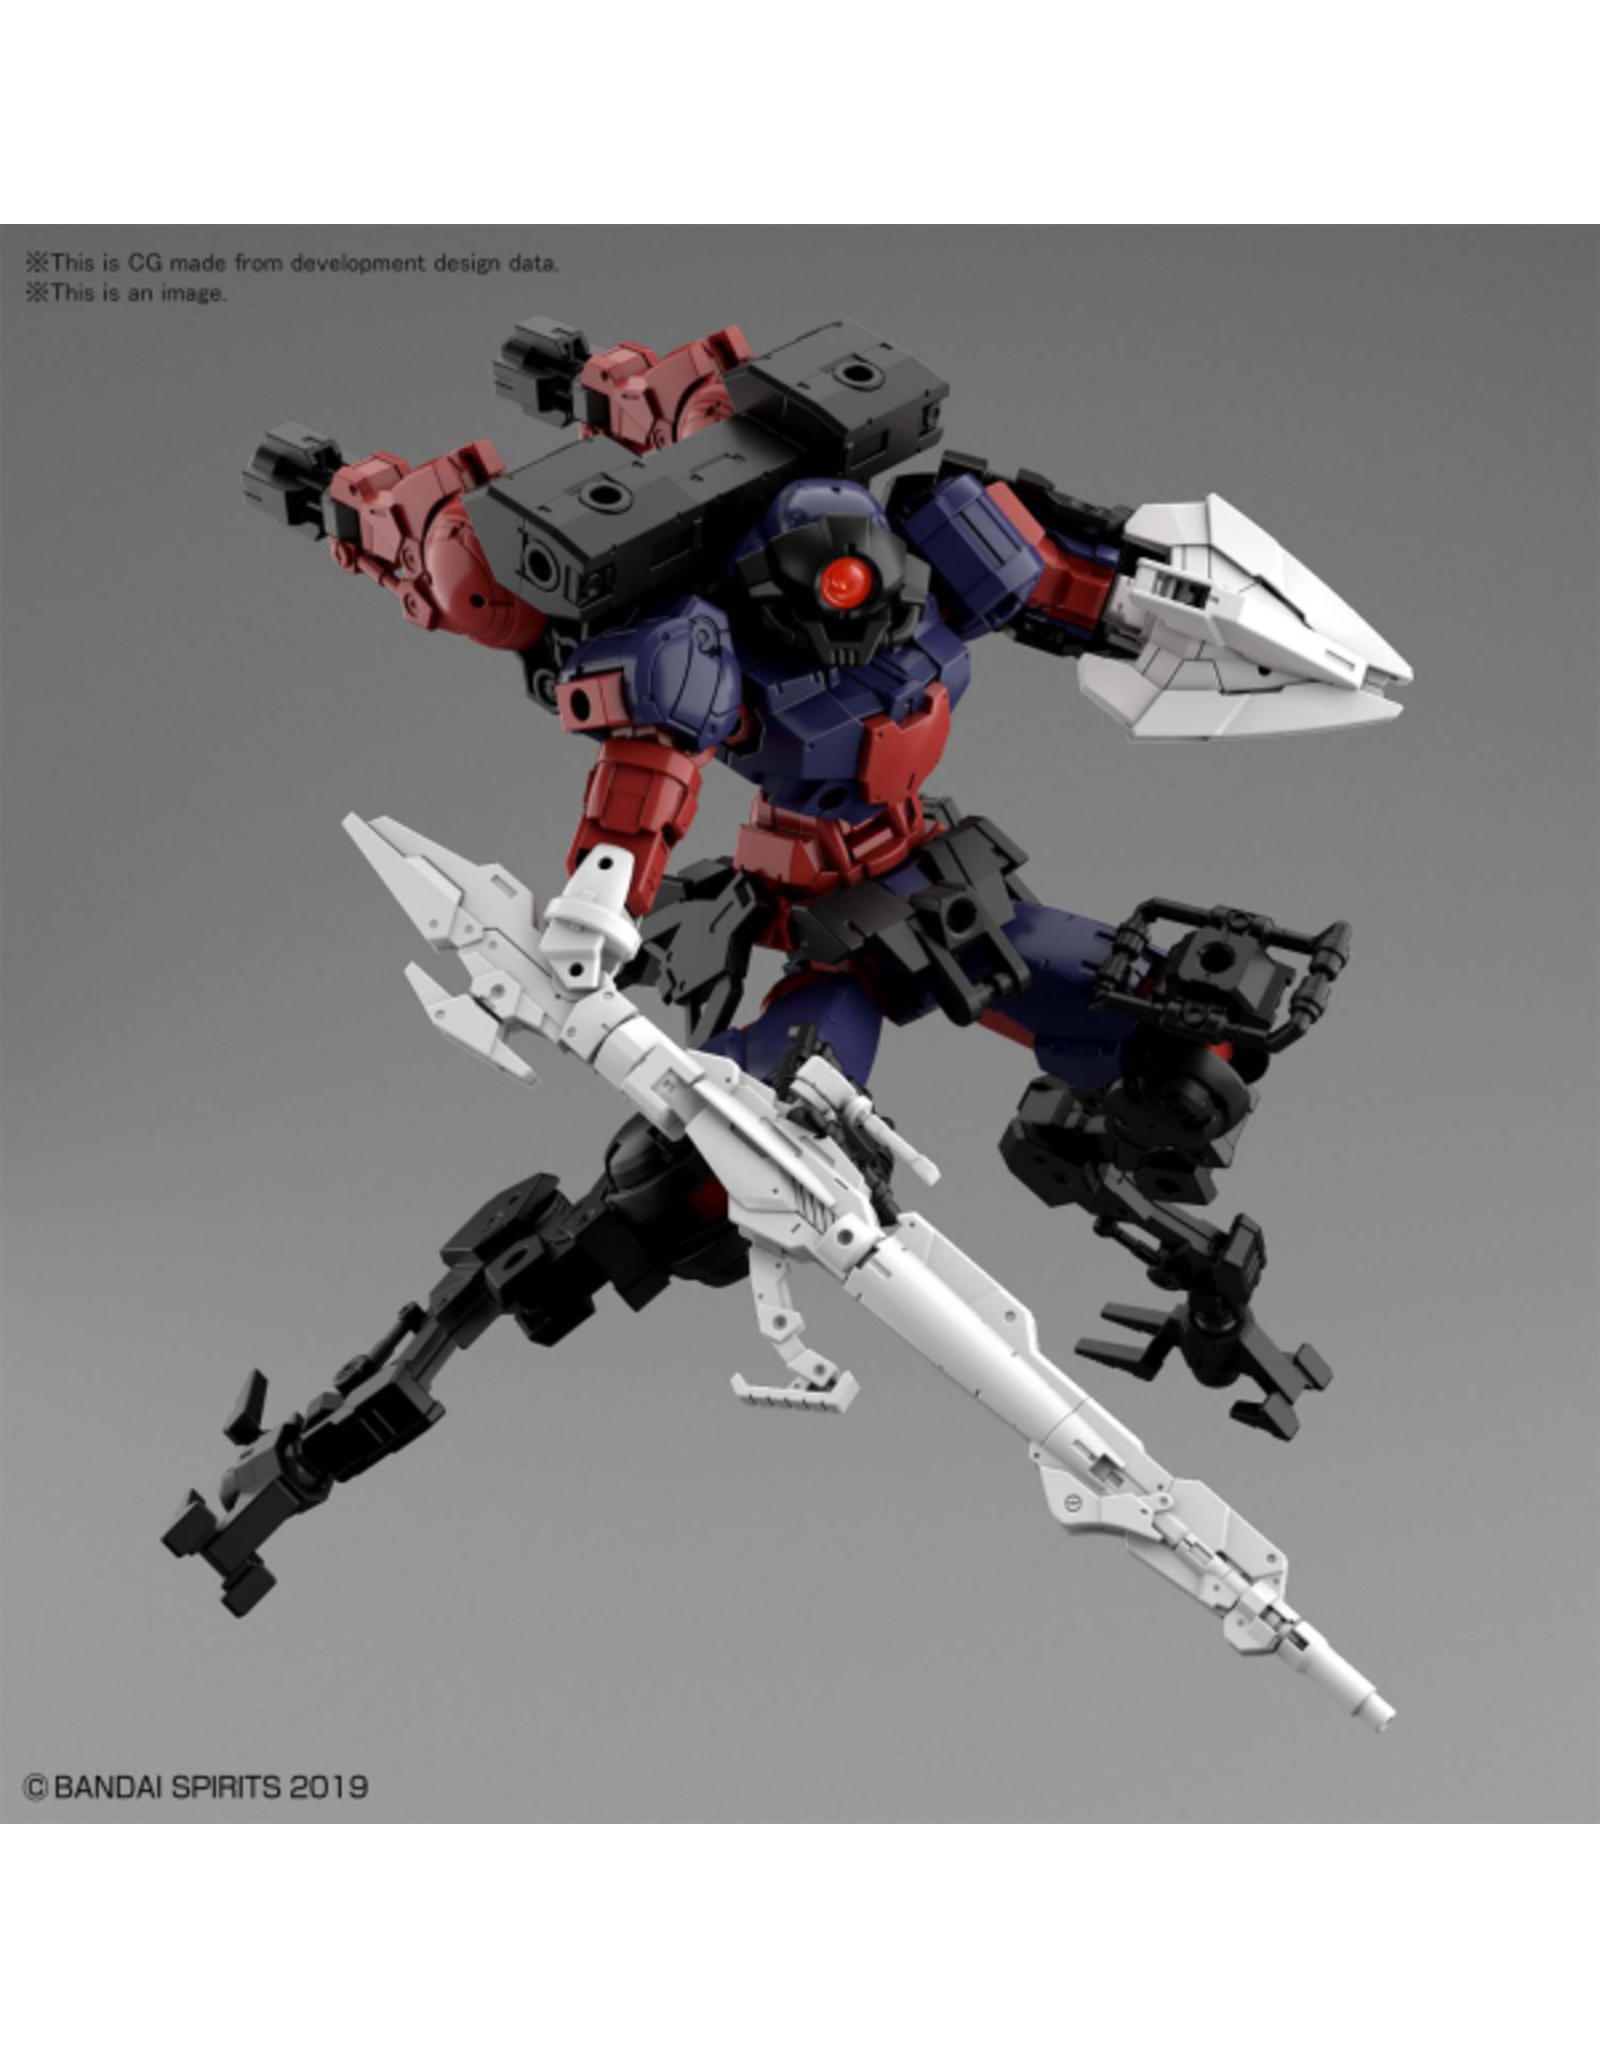 BANDAI 30MM 1/144 bEXM-15 PORTANOVA (SPACE TYPE) [DARK PURPLE]